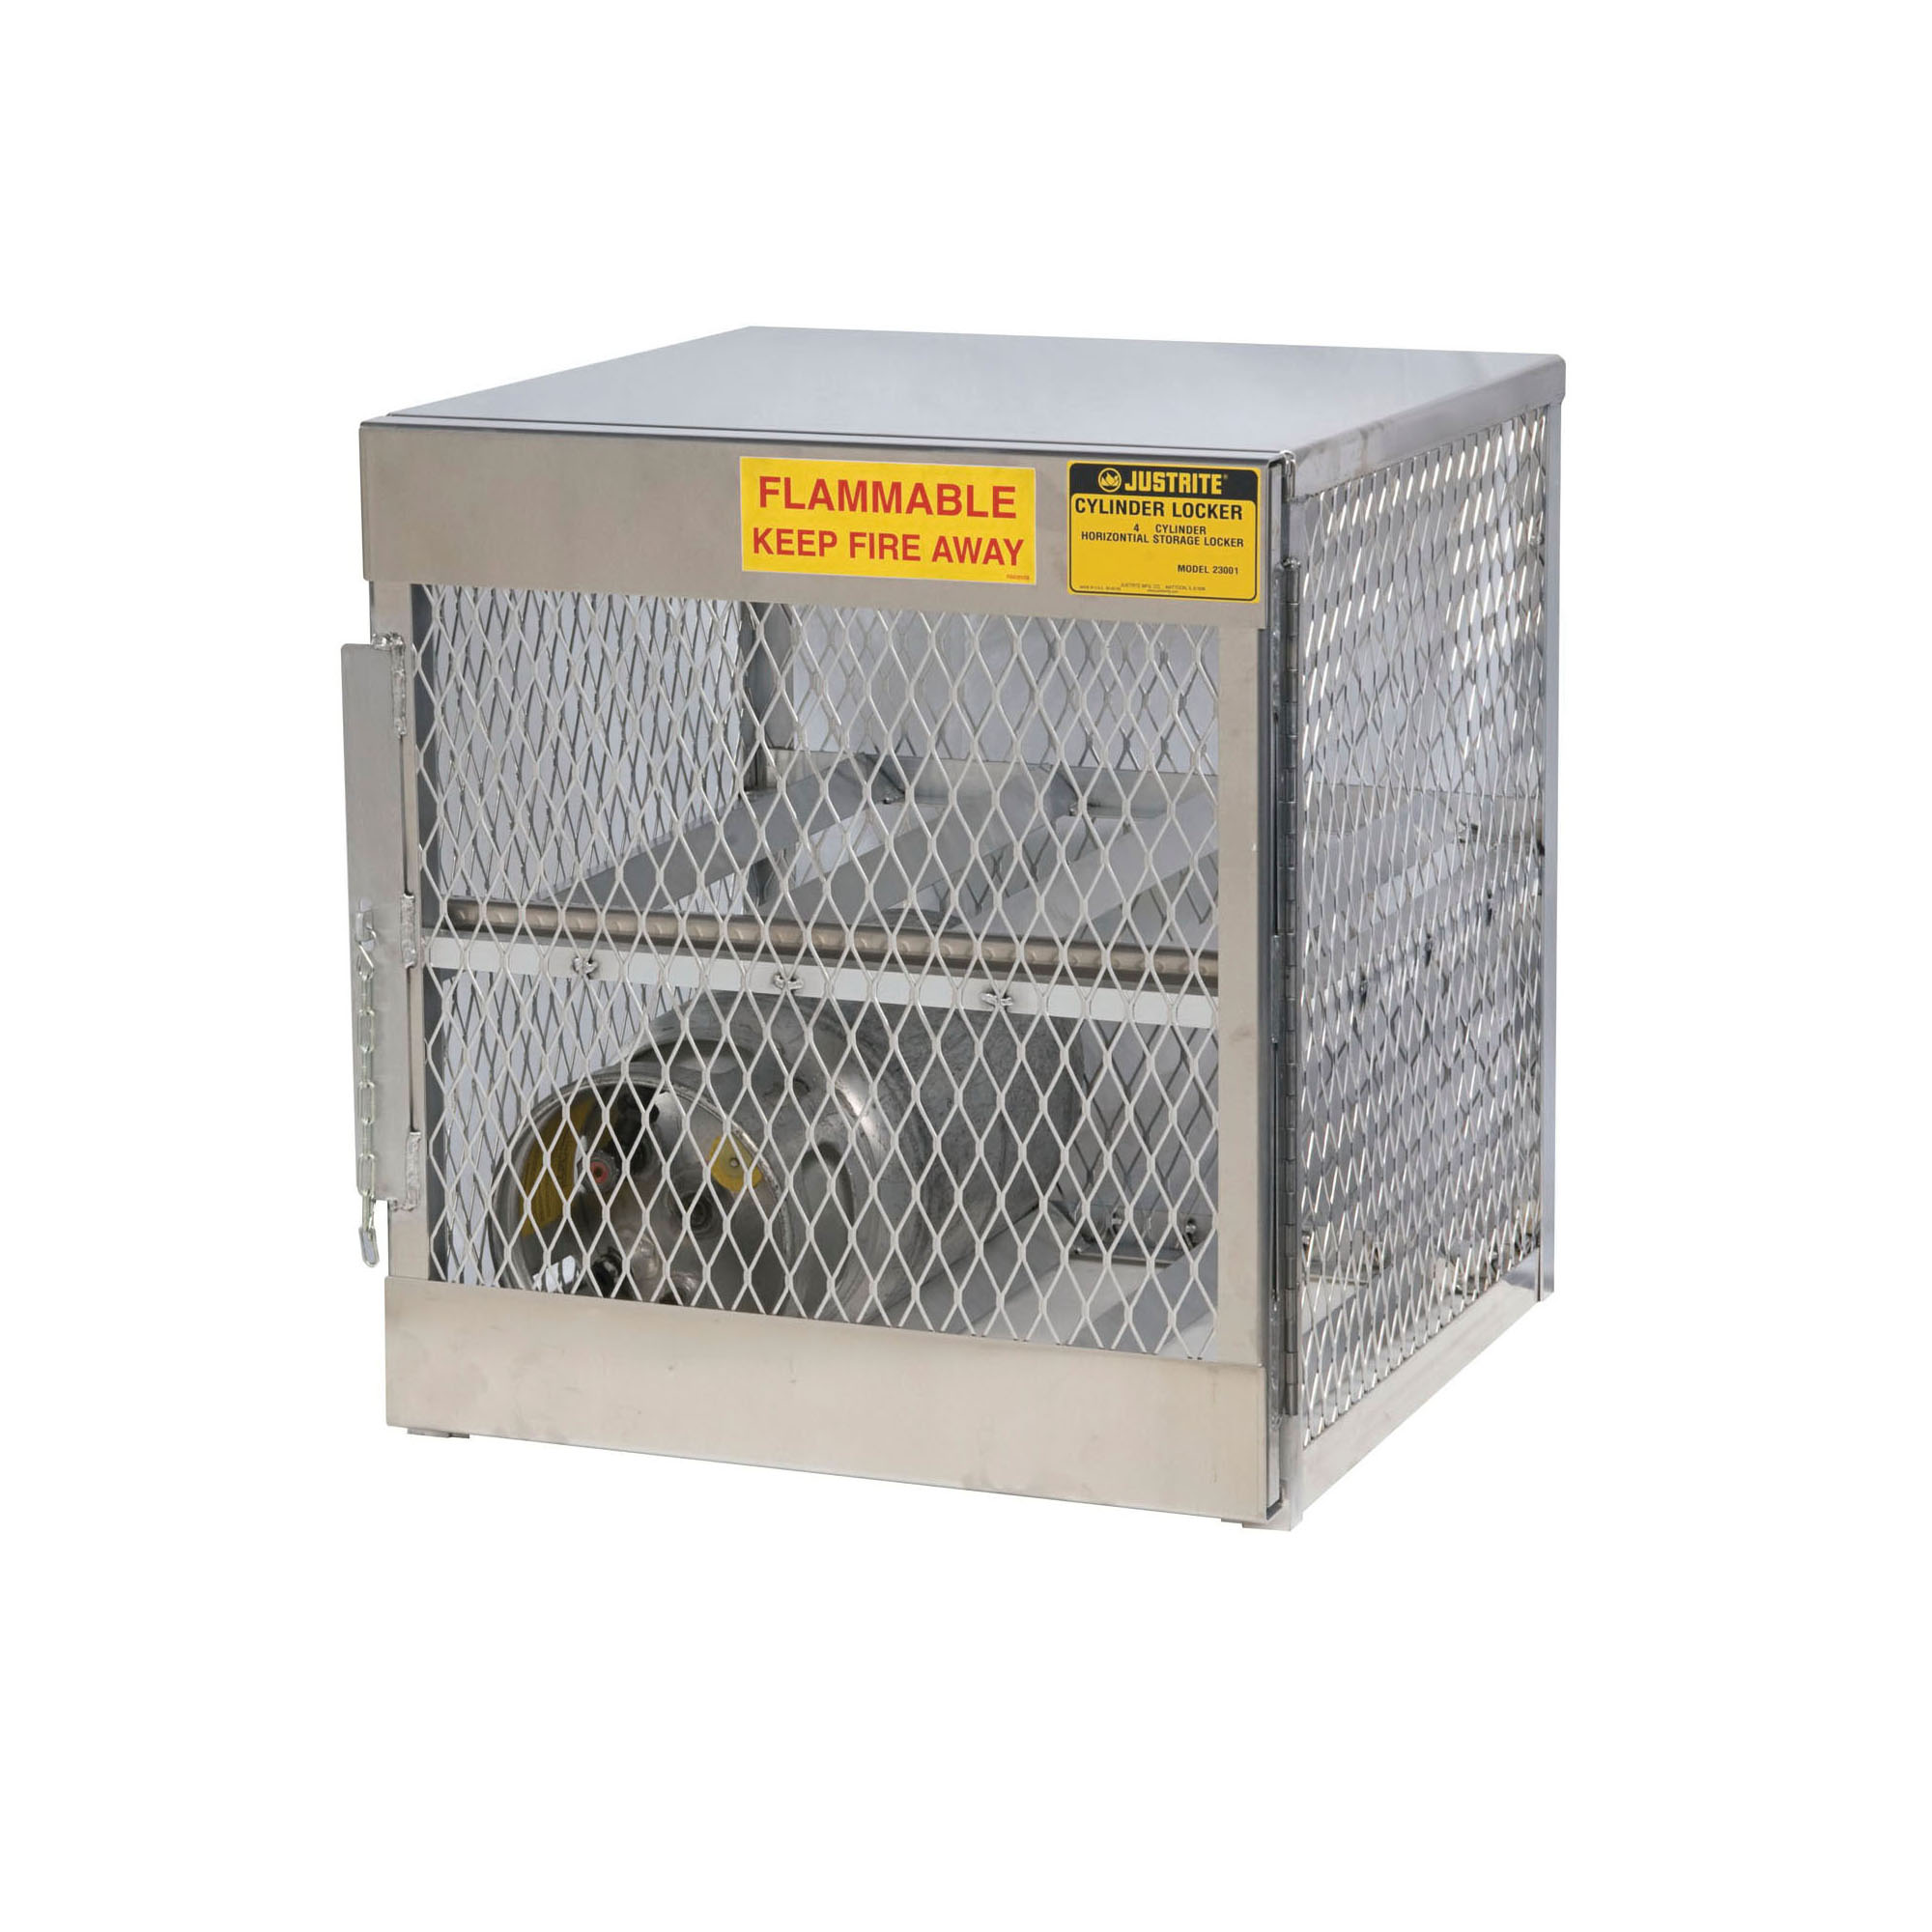 Justrite® 23001 Horizontal LPG Cylinder Locker, (4) 20 lb/33 lb, 33-1/2 in H x 30 in W x 32 in D, Aluminum Roof, Welded Aluminum, Aluminum